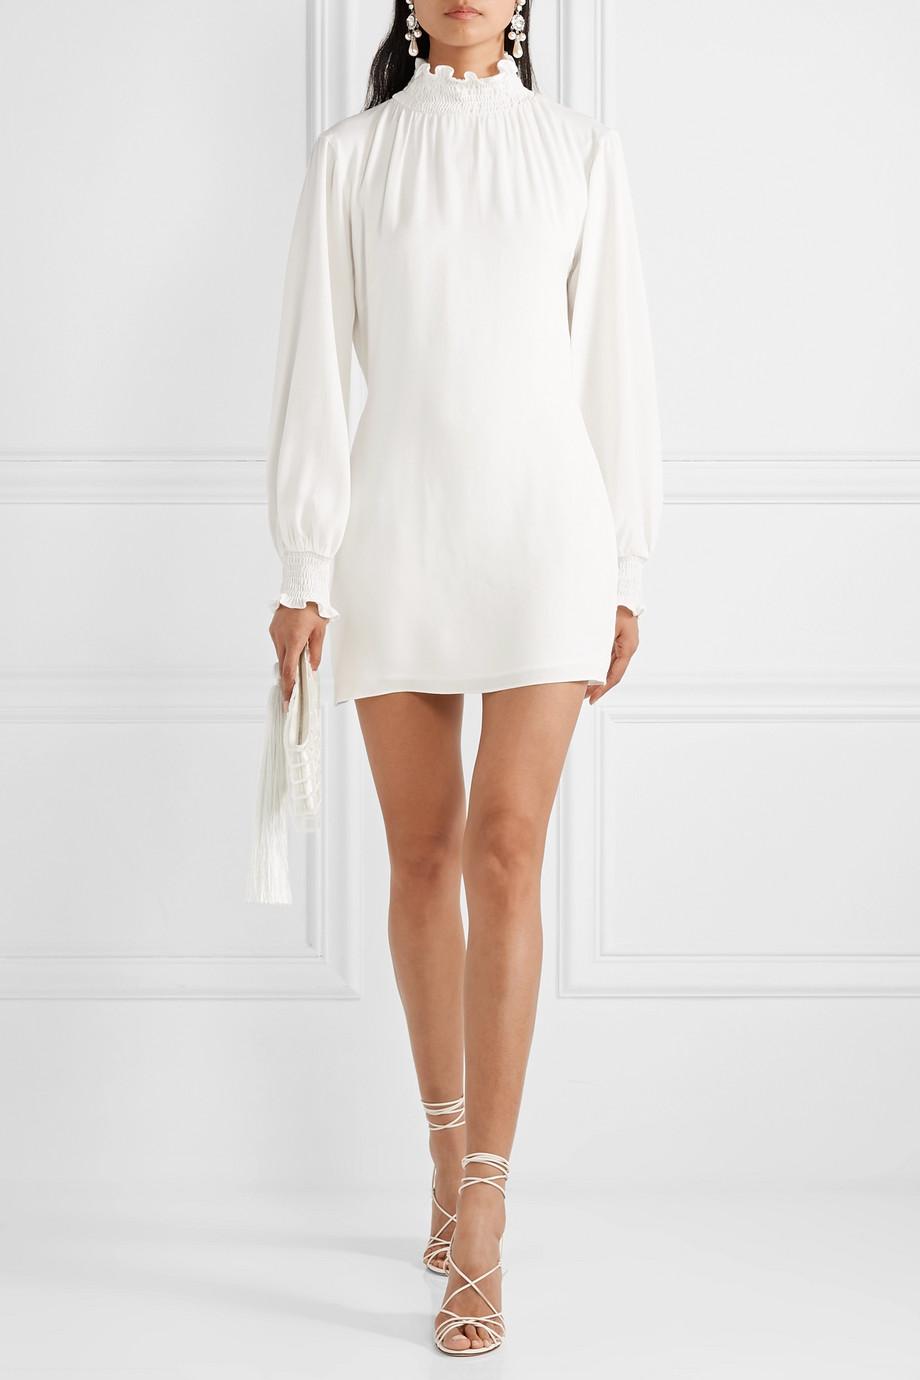 Alternativas al clásico look de novia, net a porter - Vanessa Cocchiaro - Wedding Hub - 01